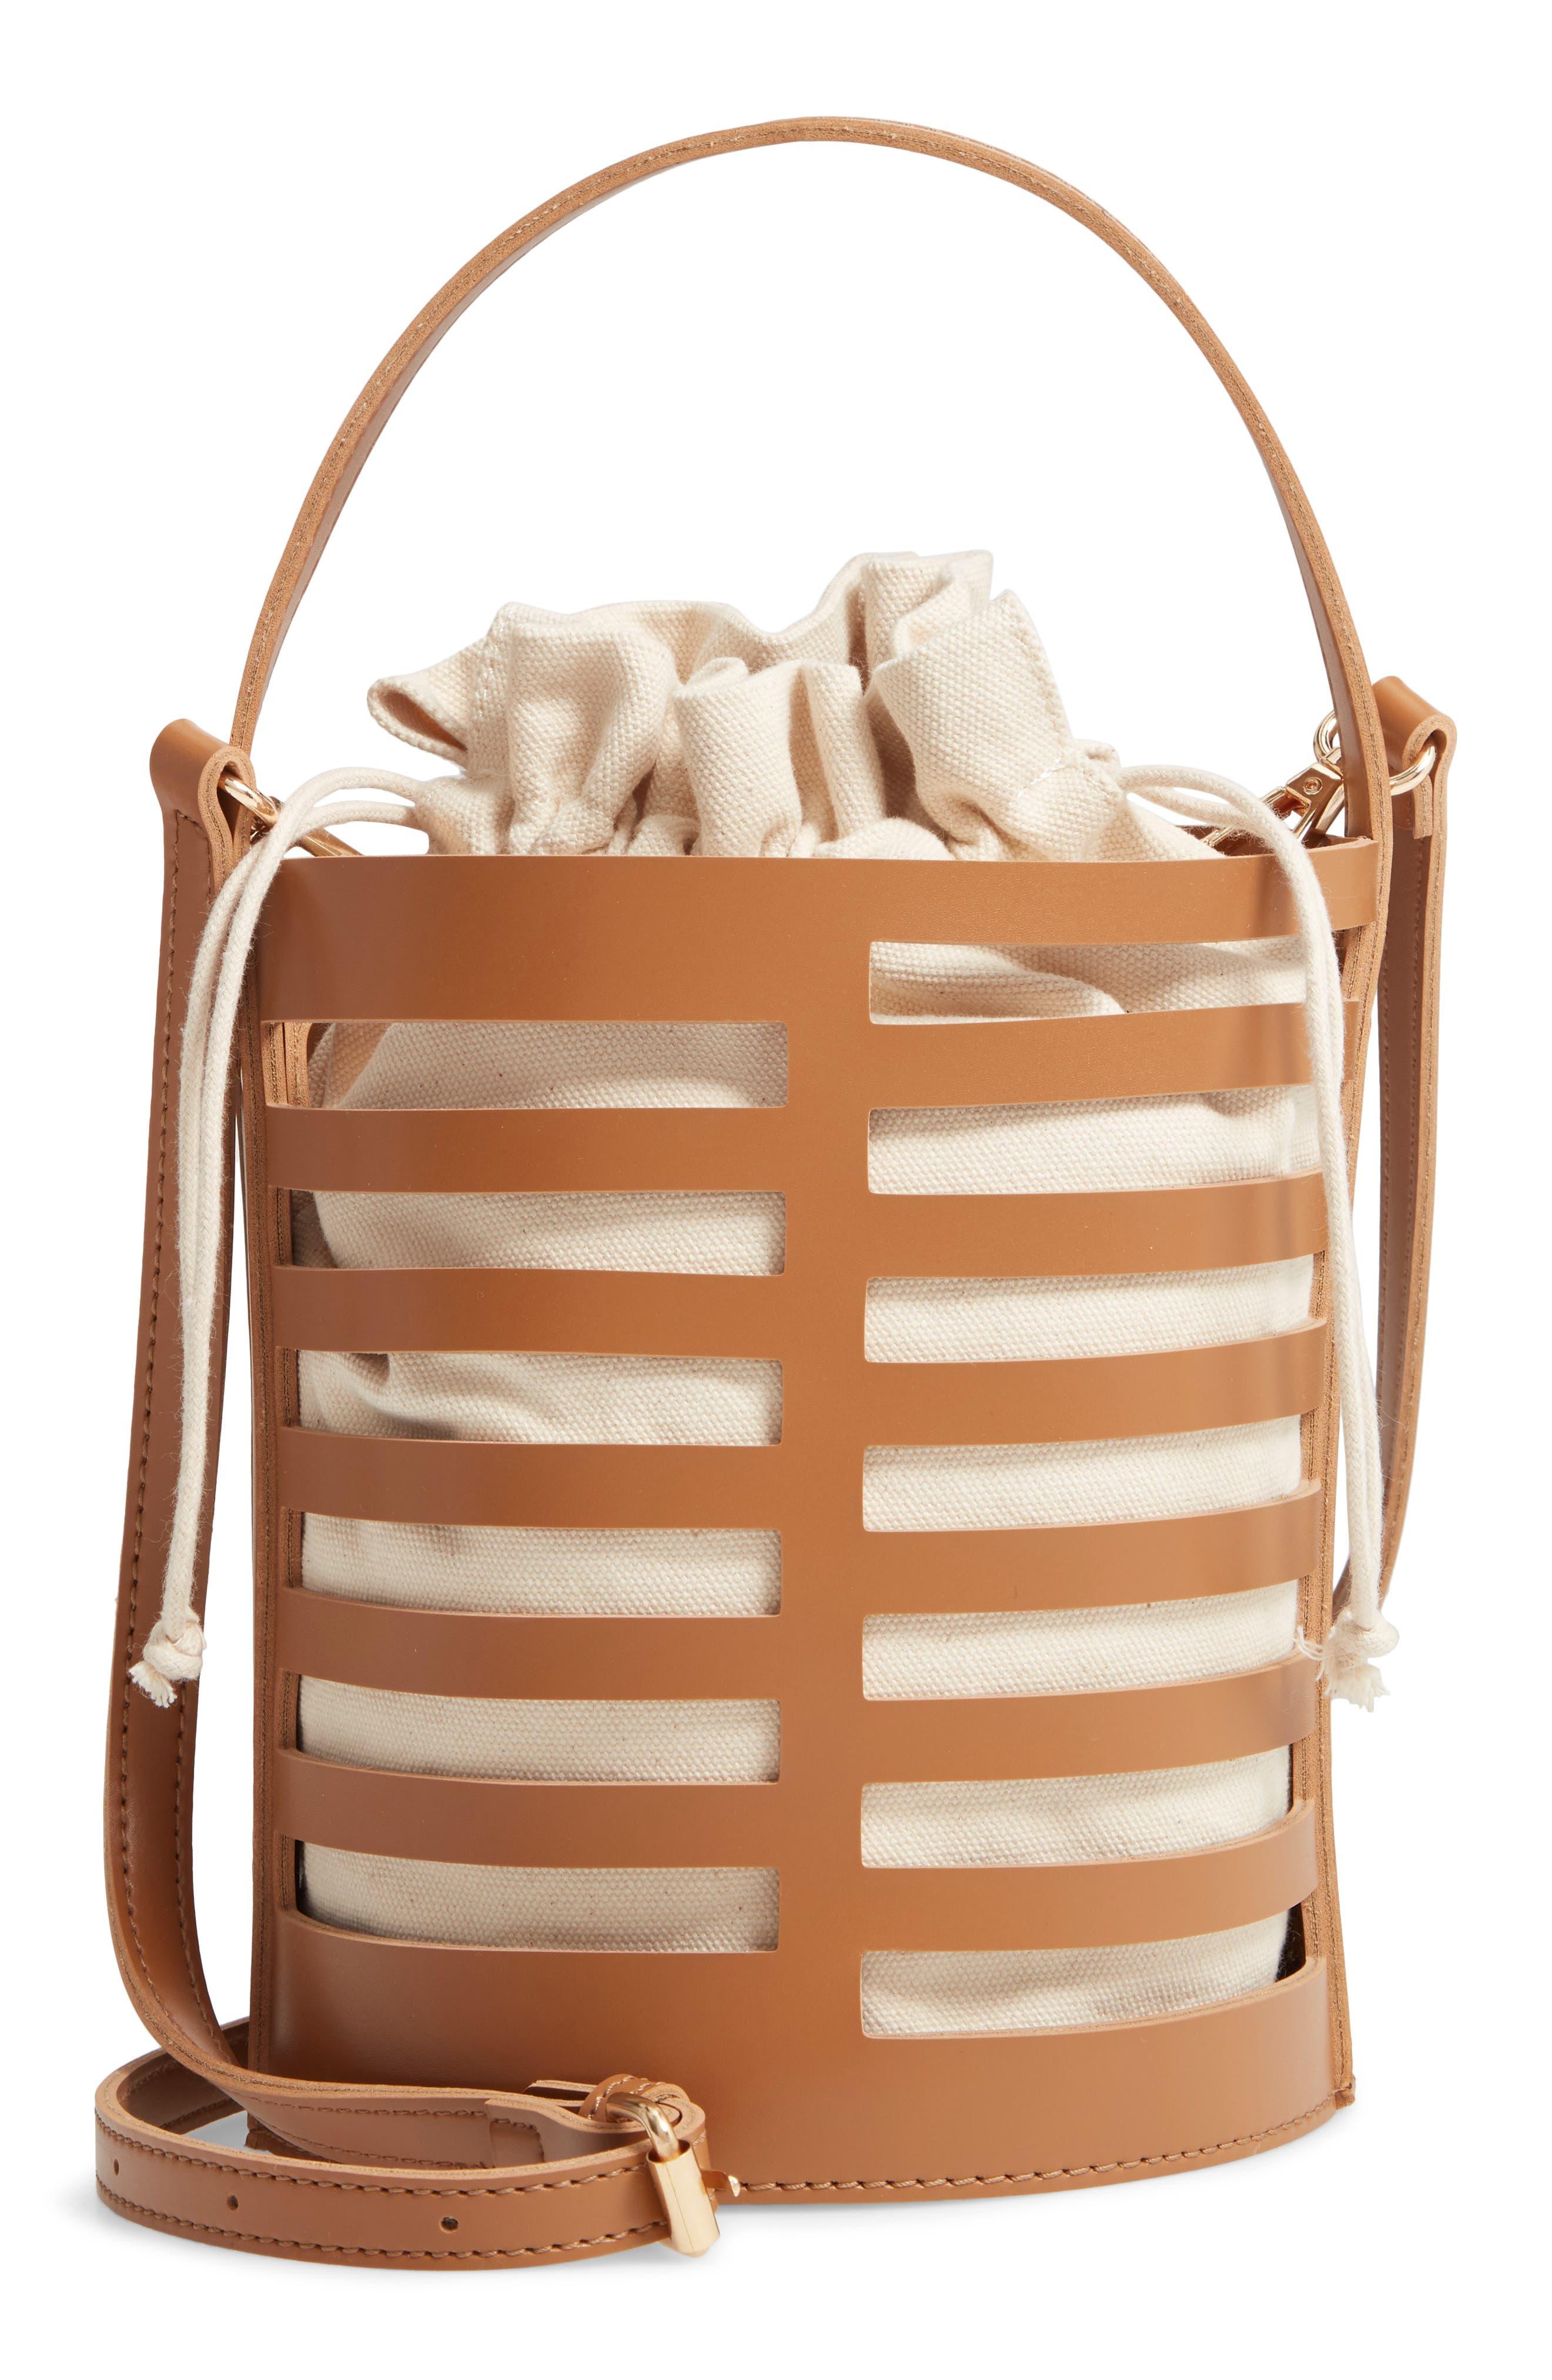 Cutout Round Bucket Crossbody Bag,                             Main thumbnail 1, color,                             TAN